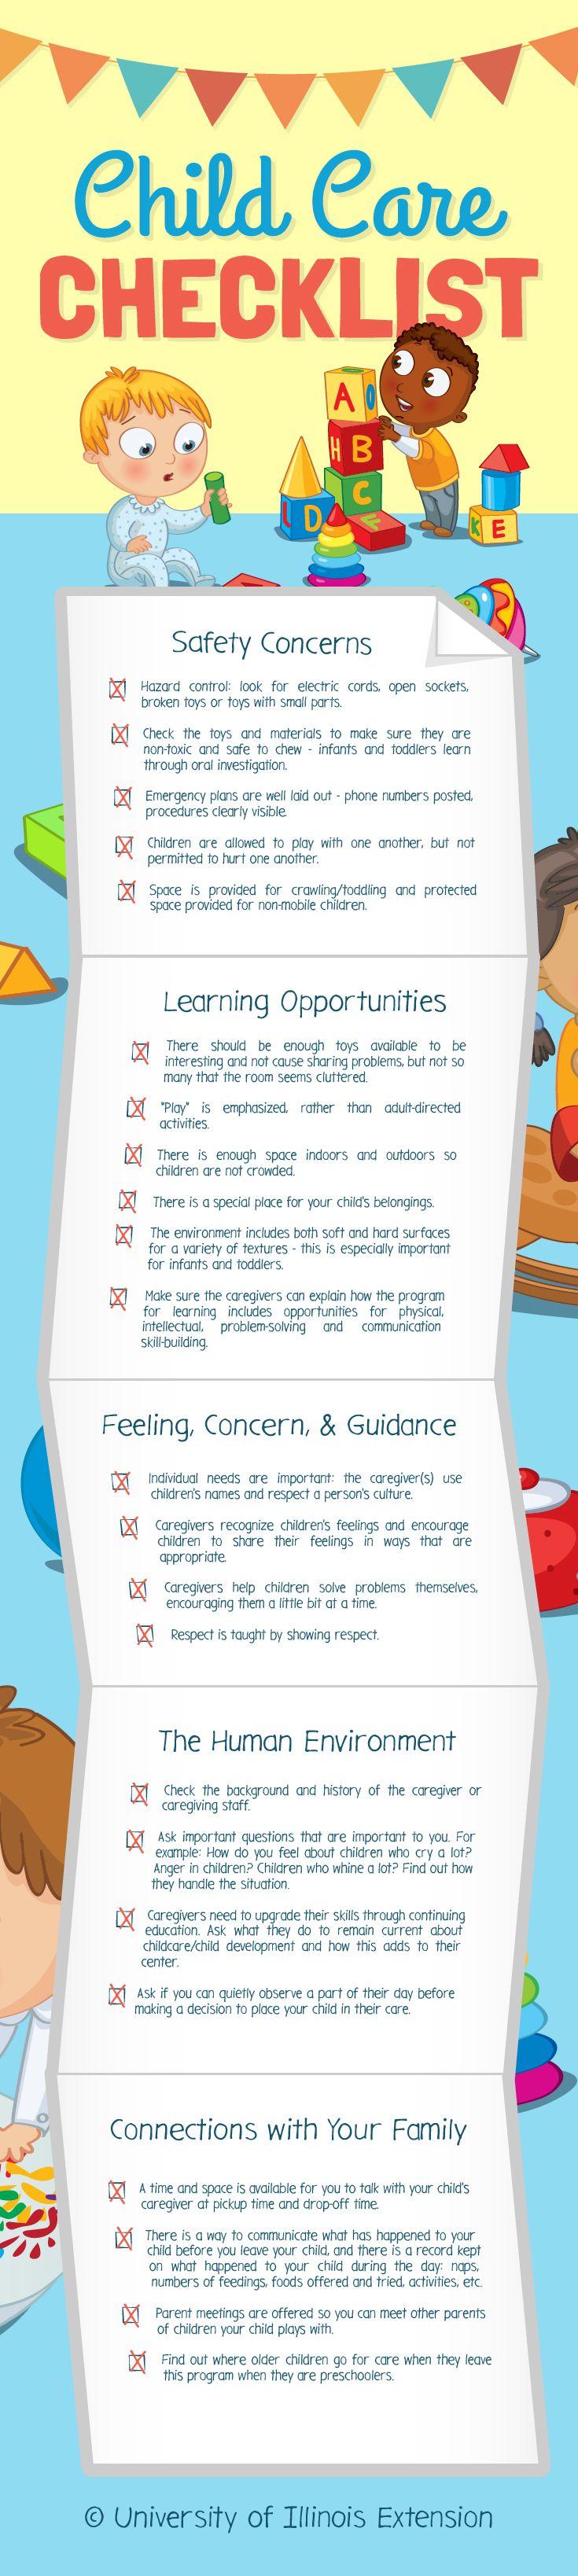 Best 25+ Daycare schedule ideas on Pinterest   Childcare ...